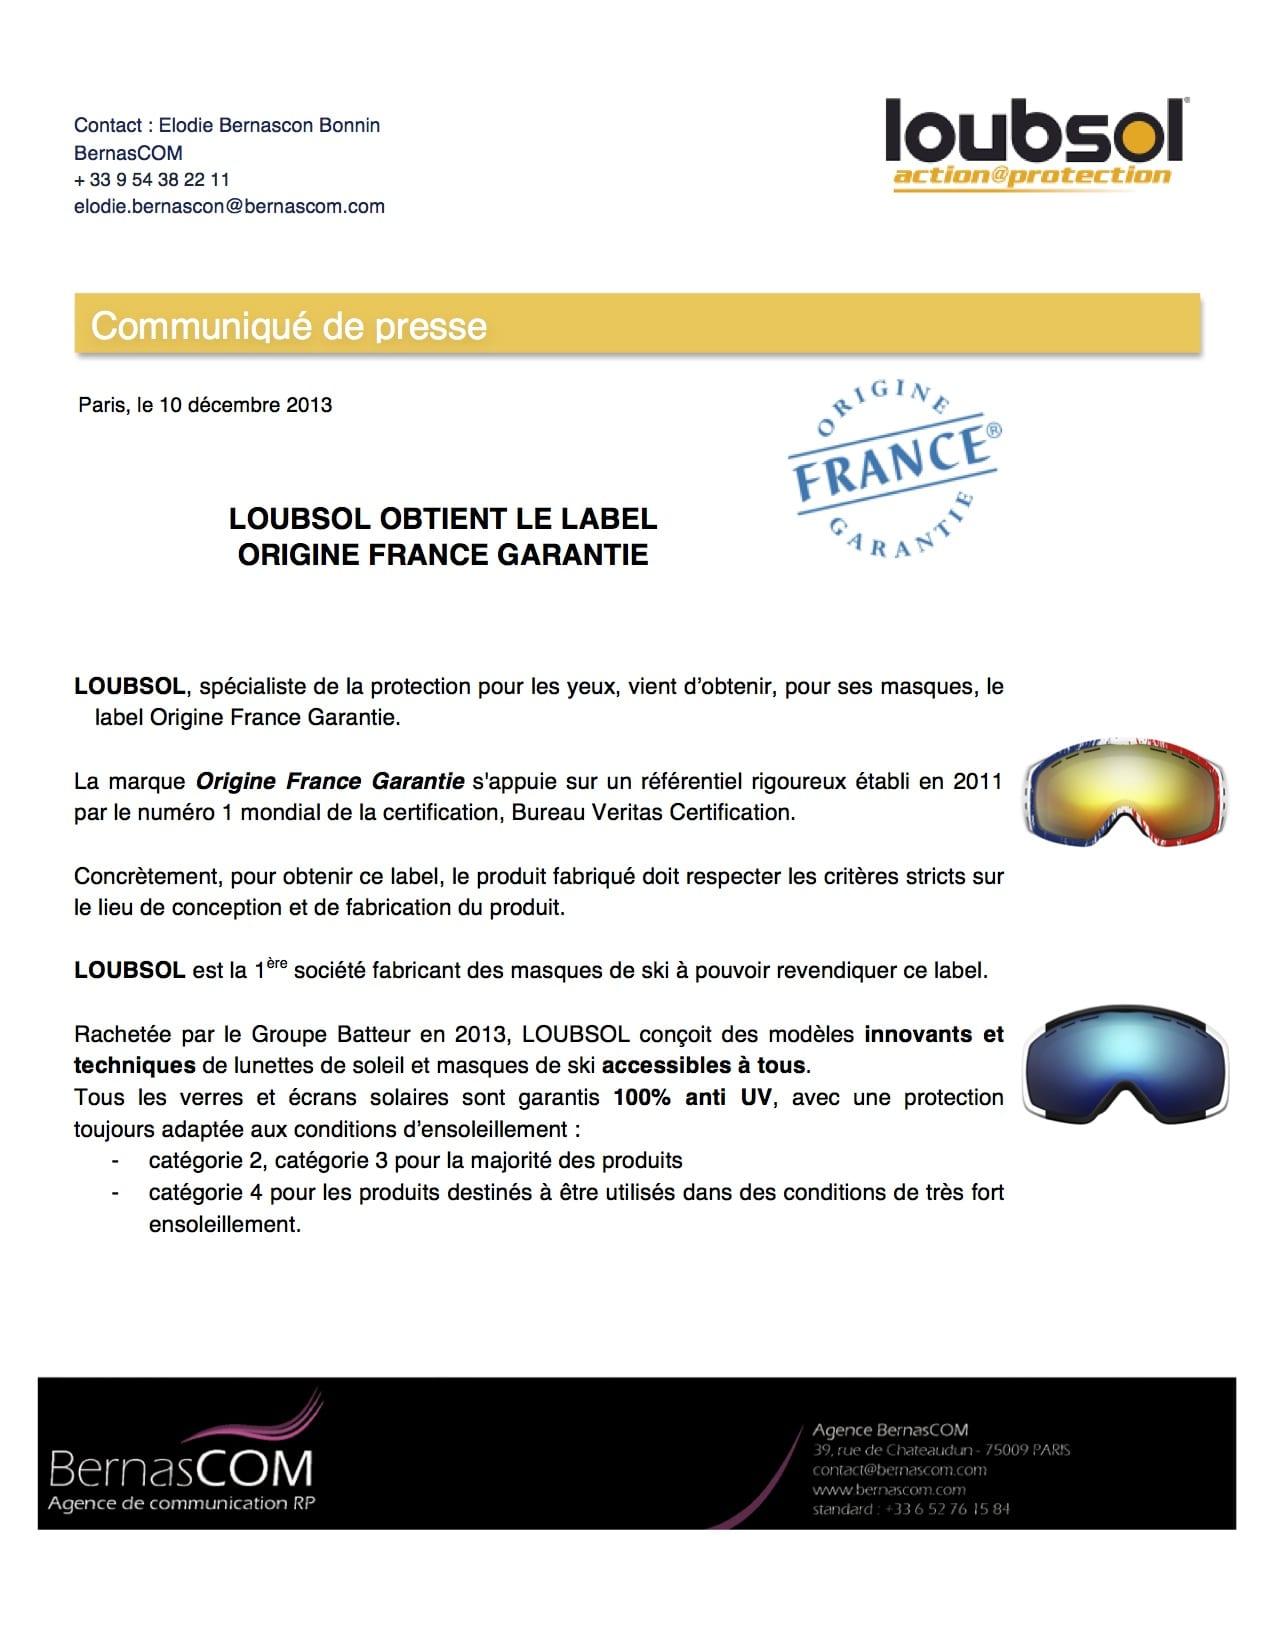 LOUBSOL - CP Origine France Garantie